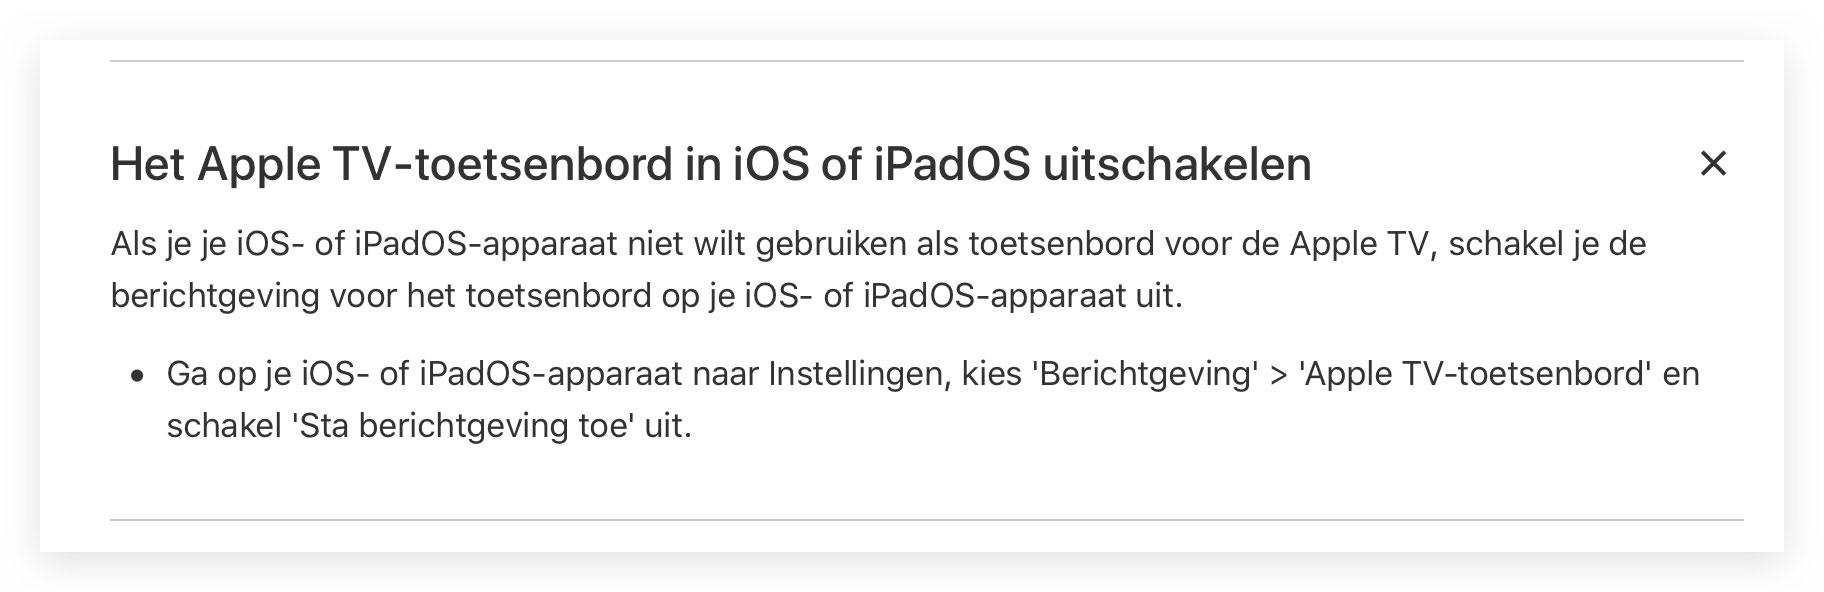 https://www.macfreak.nl/modules/news/images/zArt.HandleidingTvOS15AppleTVtoetsenbordUitschakelen.jpg